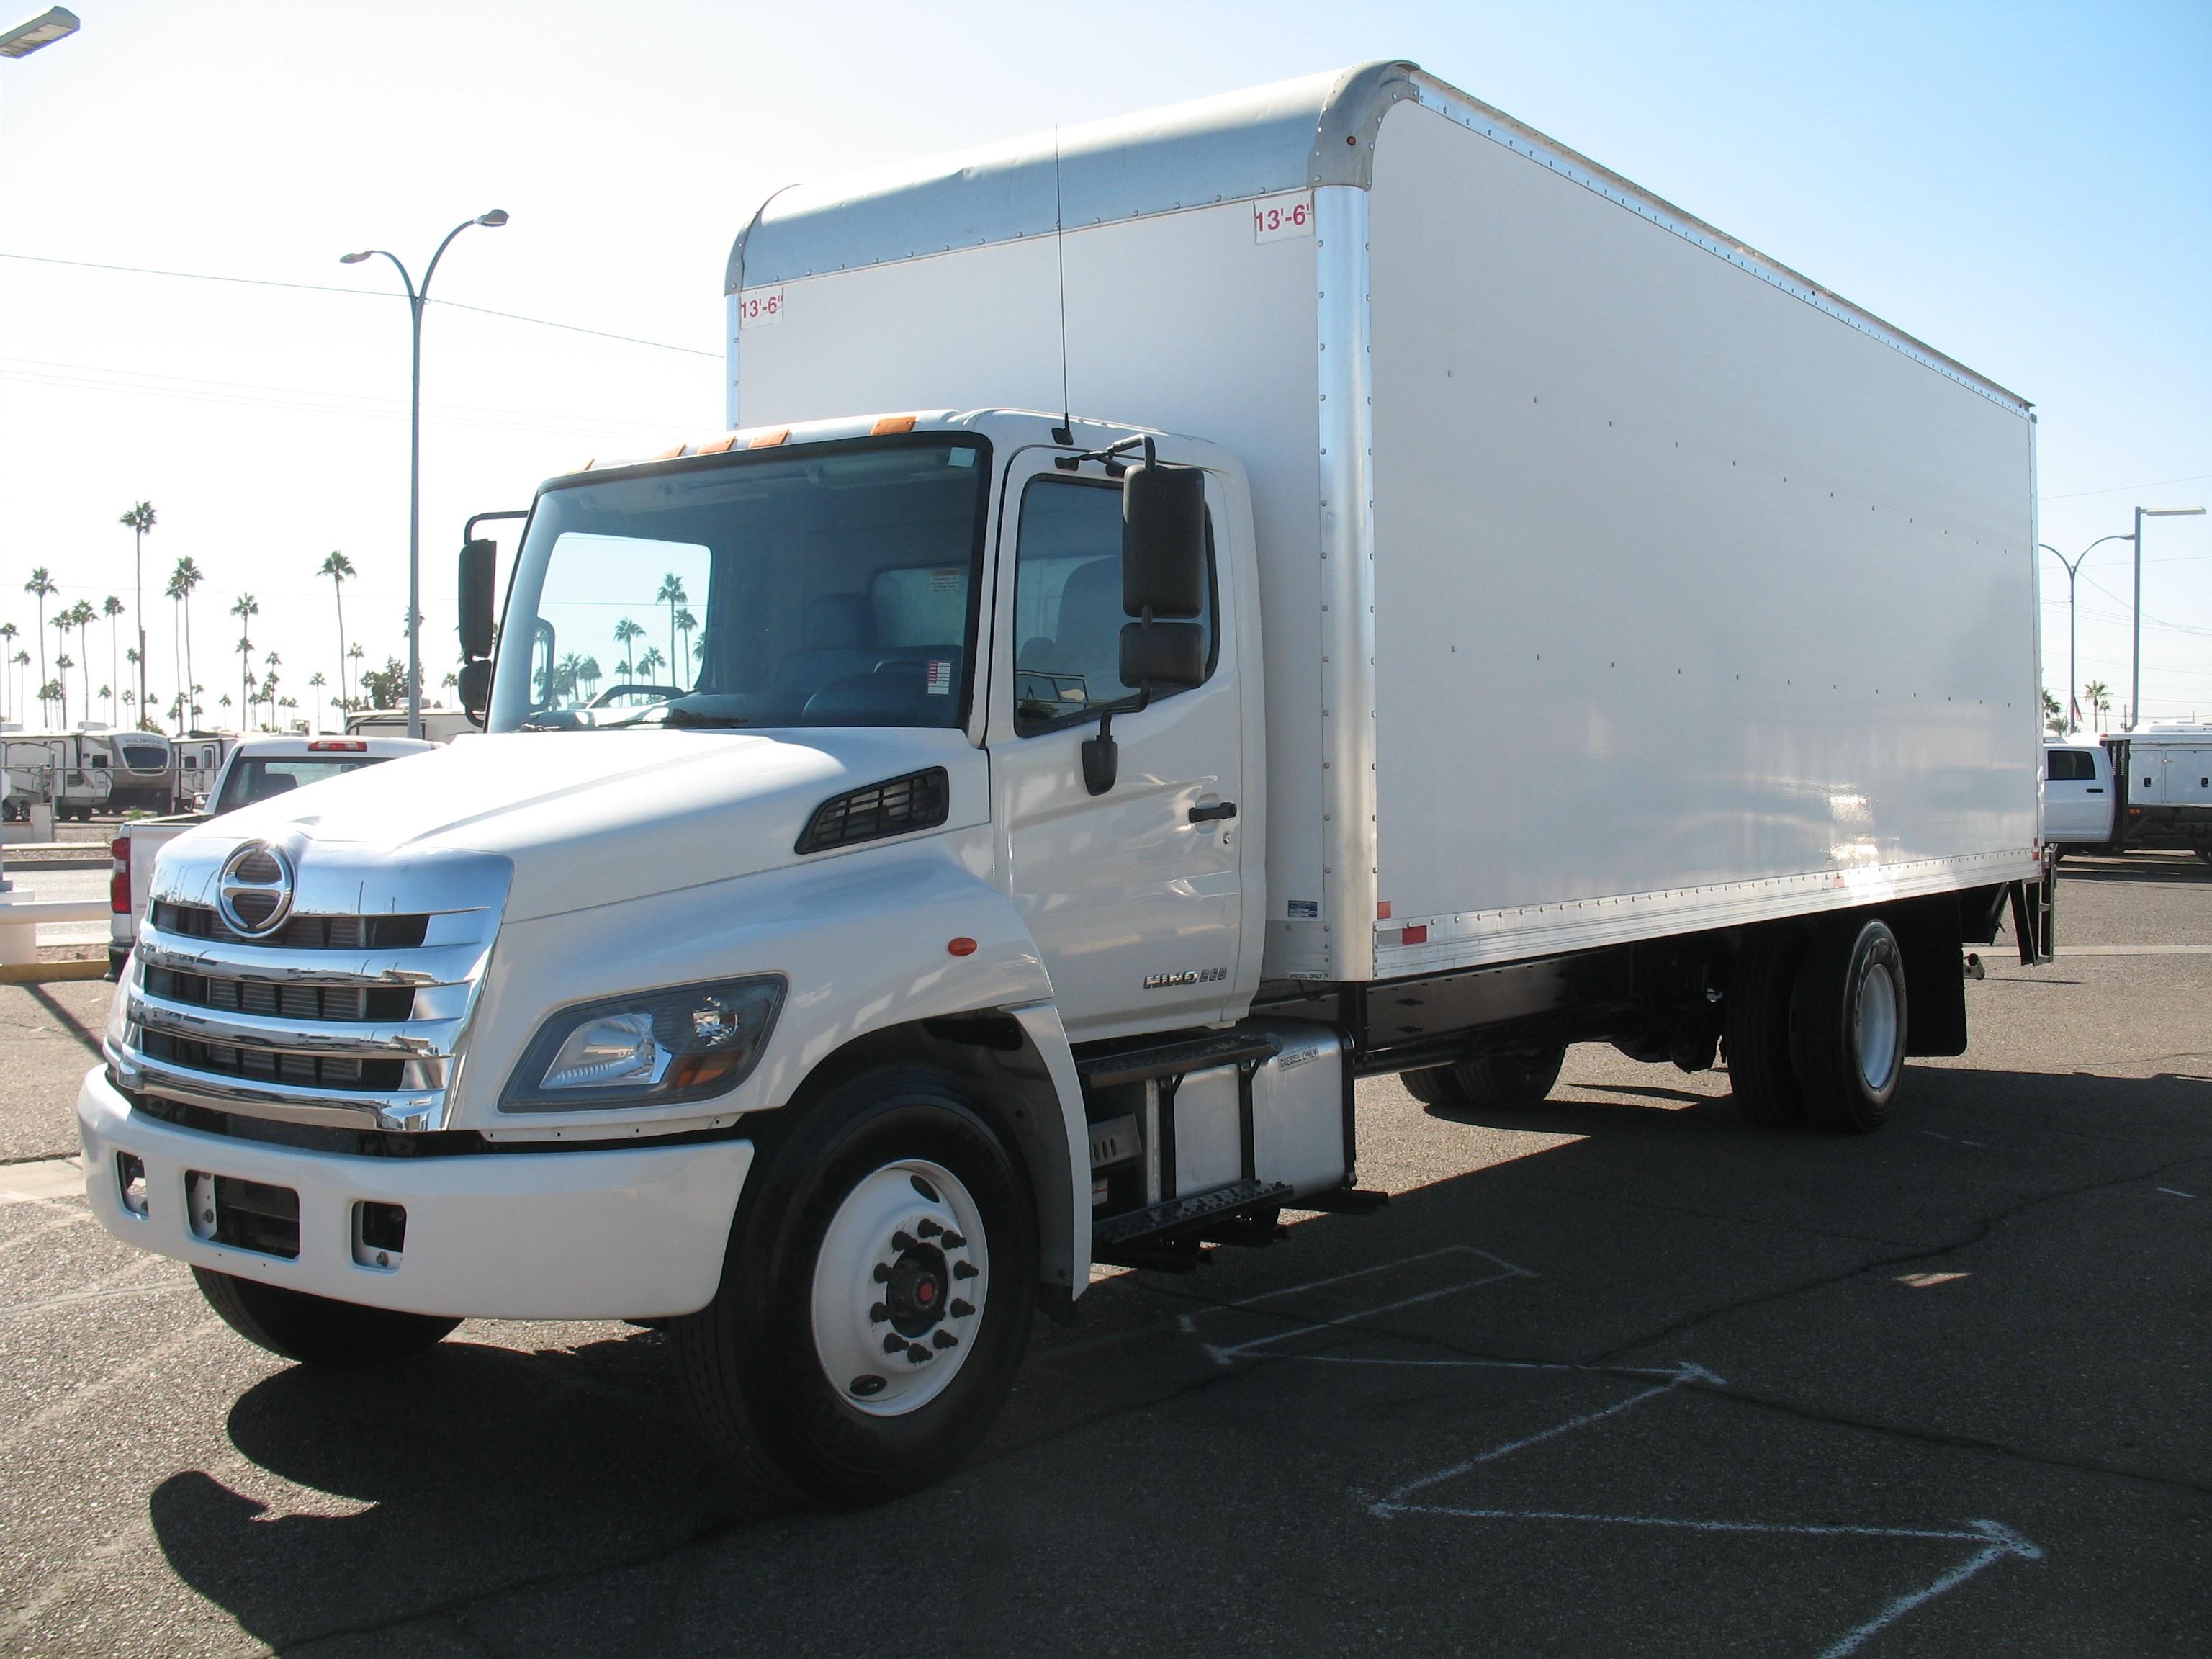 Used, 2018, Hino, 268, Van Trucks